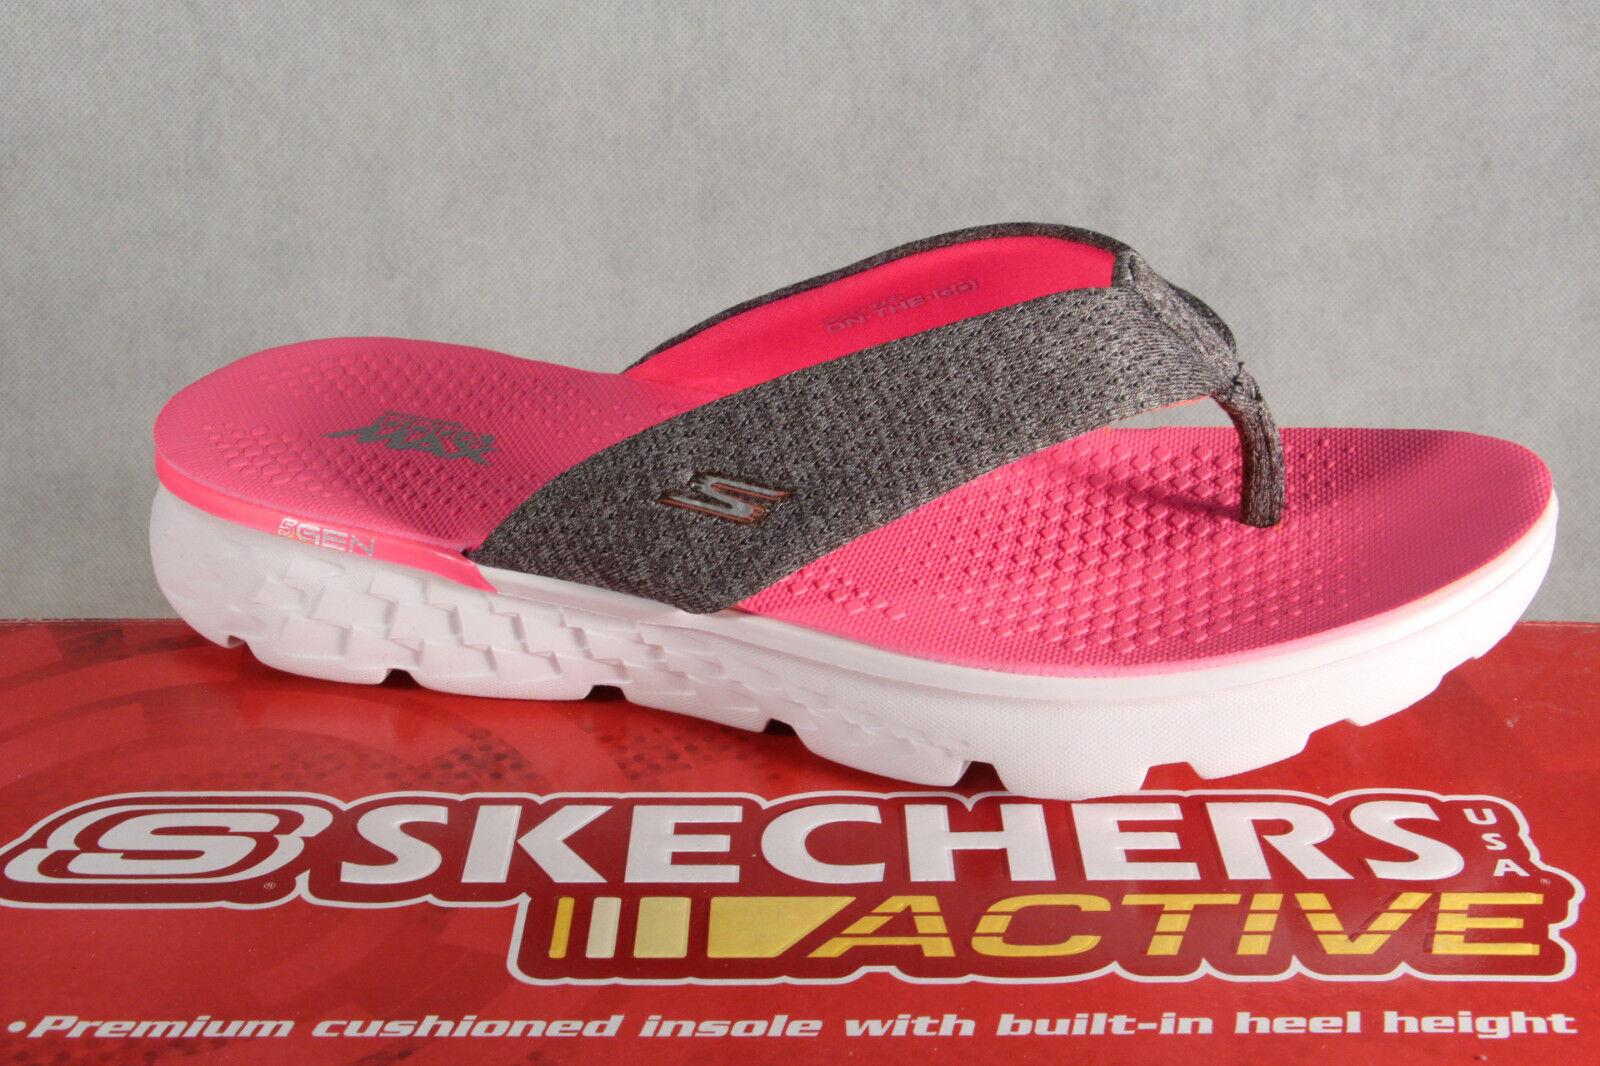 Skechers Damen Zehenstegpantolette Pantolette Pantoletten grau/pink 14656 NEU